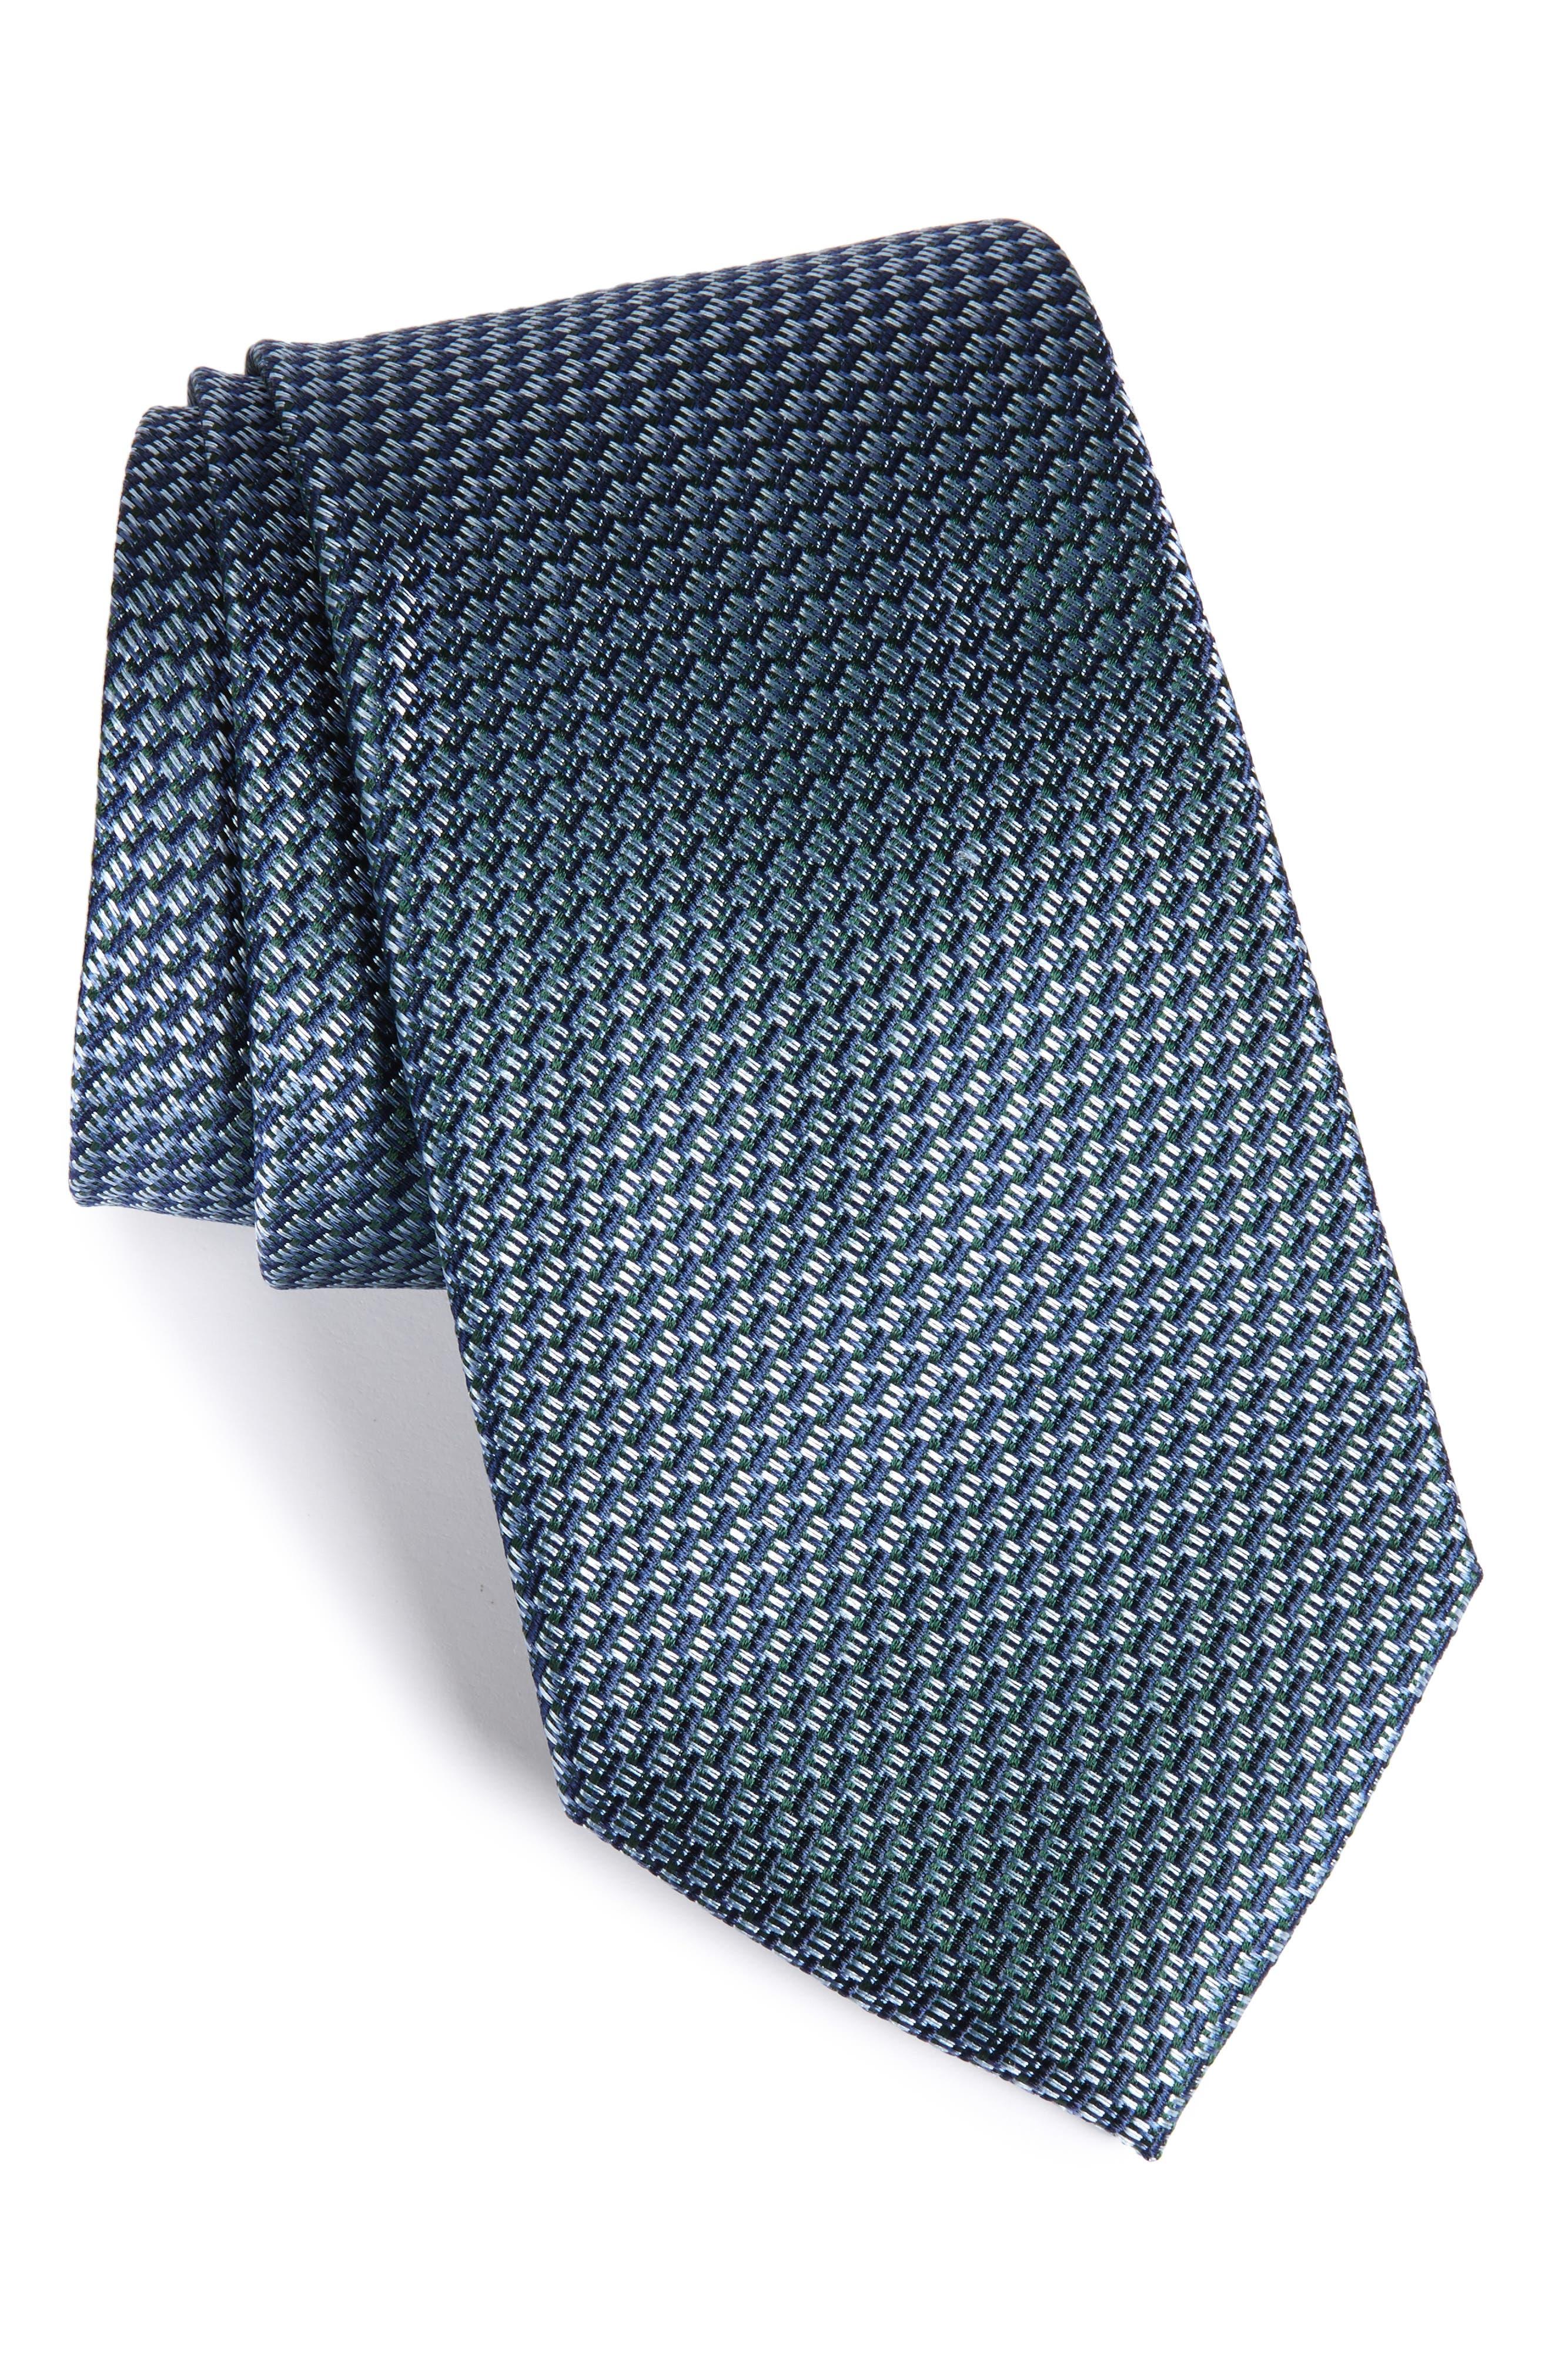 NORDSTROM MENS SHOP Nordstrom Tech Woven Silk Tie